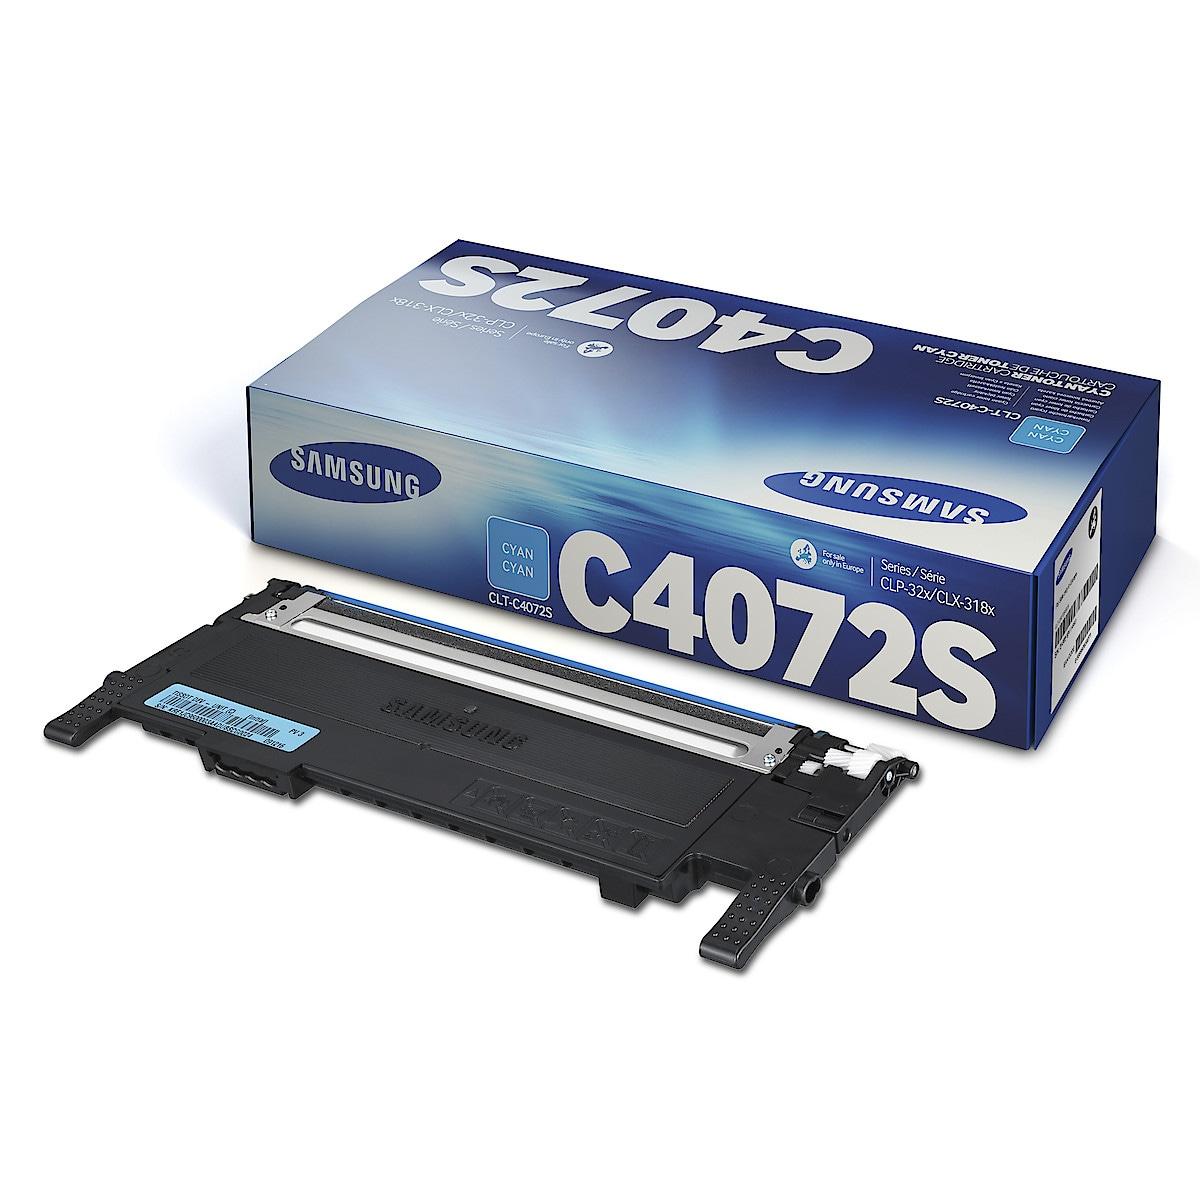 Toner Samsung CLT-4072